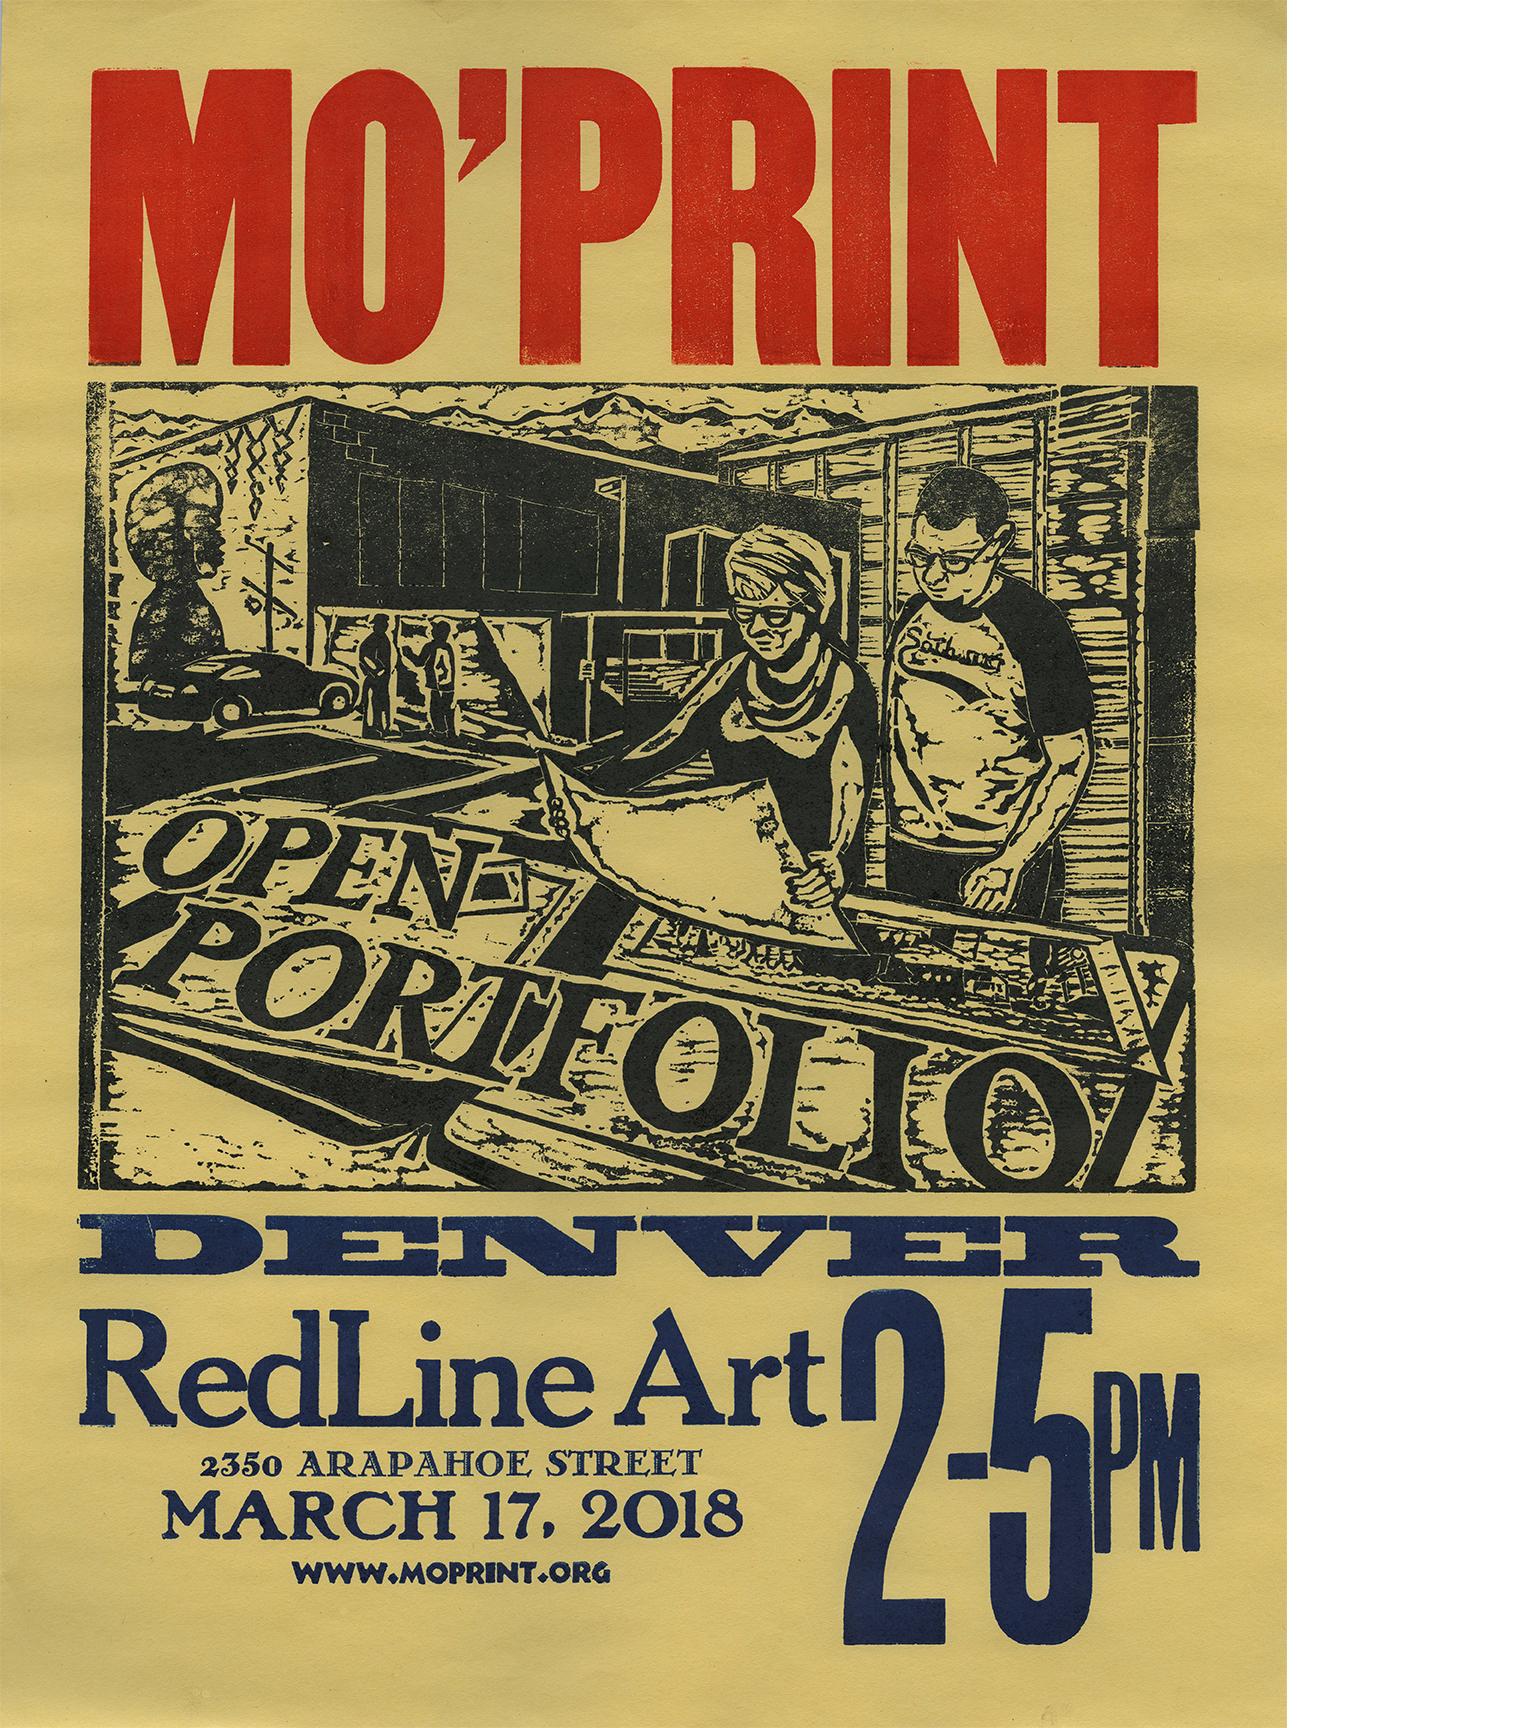 Open Portfolio - Saturday, March 172:00 PM - 5:00 PMFree to attendRedLine2350 Arapahoe St, Denver, CO 80205